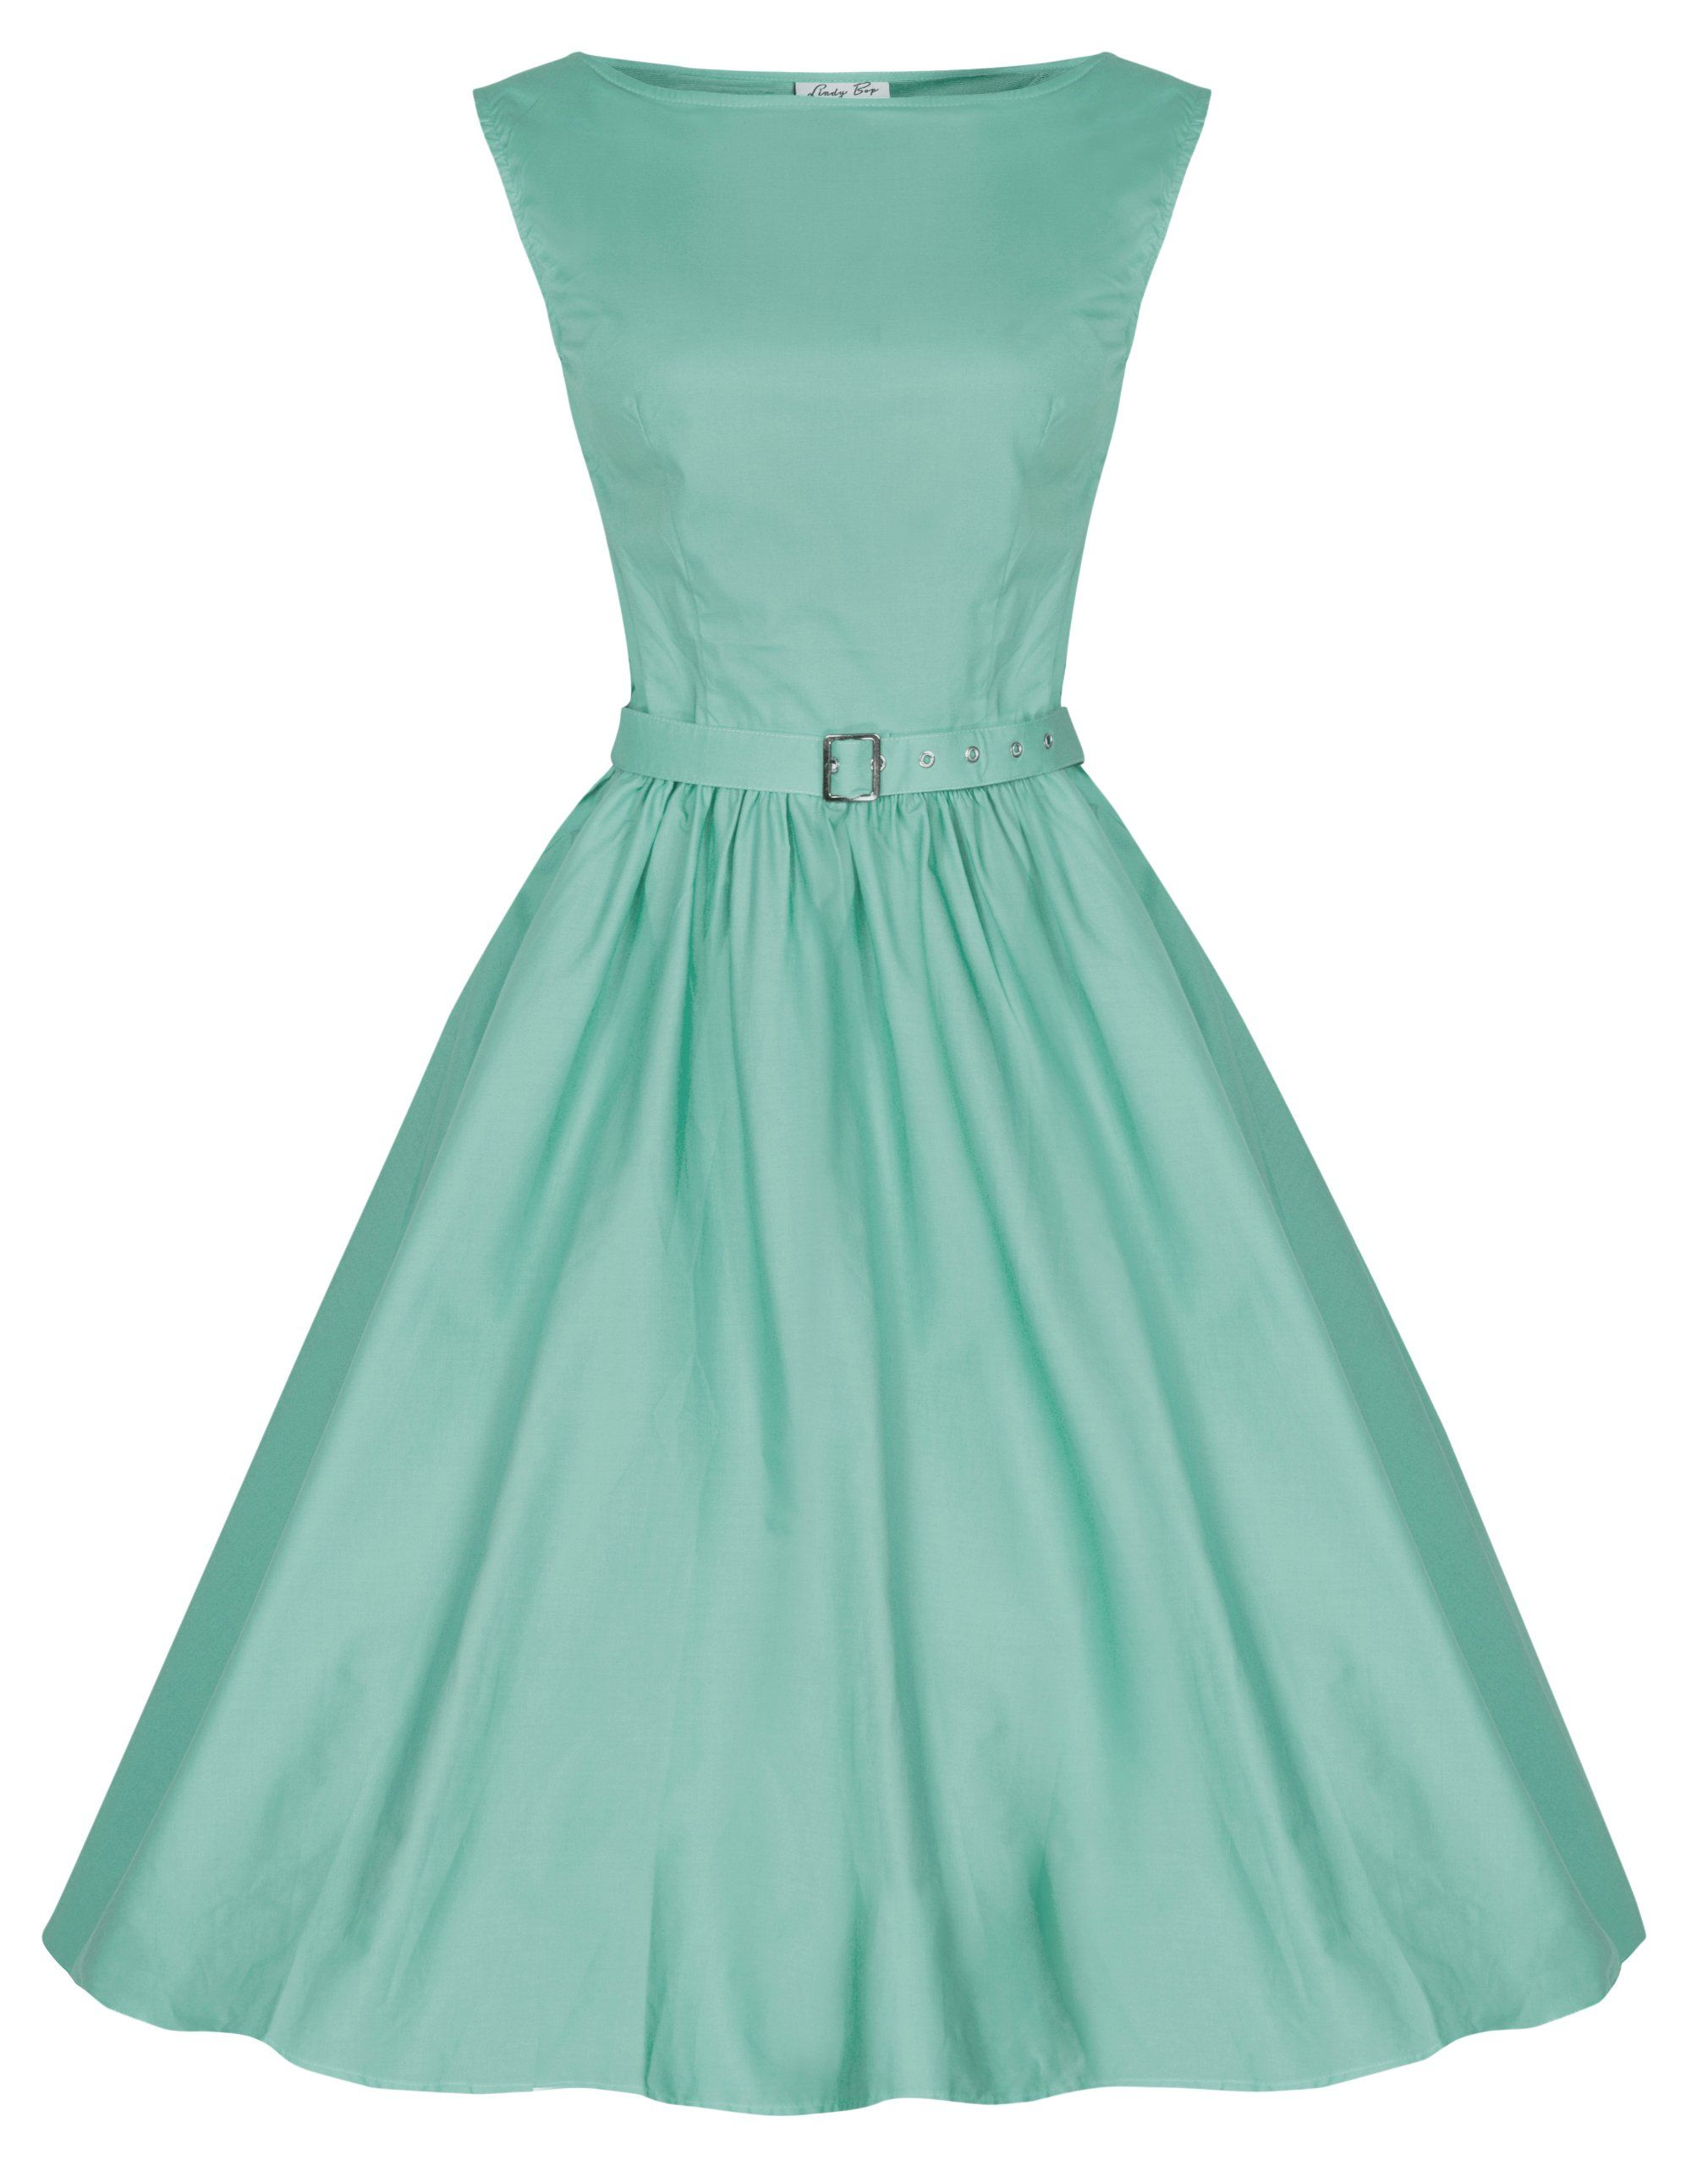 a7c416fd5182 Lindy Bop  Audrey  Hepburn Style Vintage 1950 s Pastel Rockabilly Swing  Dress (S